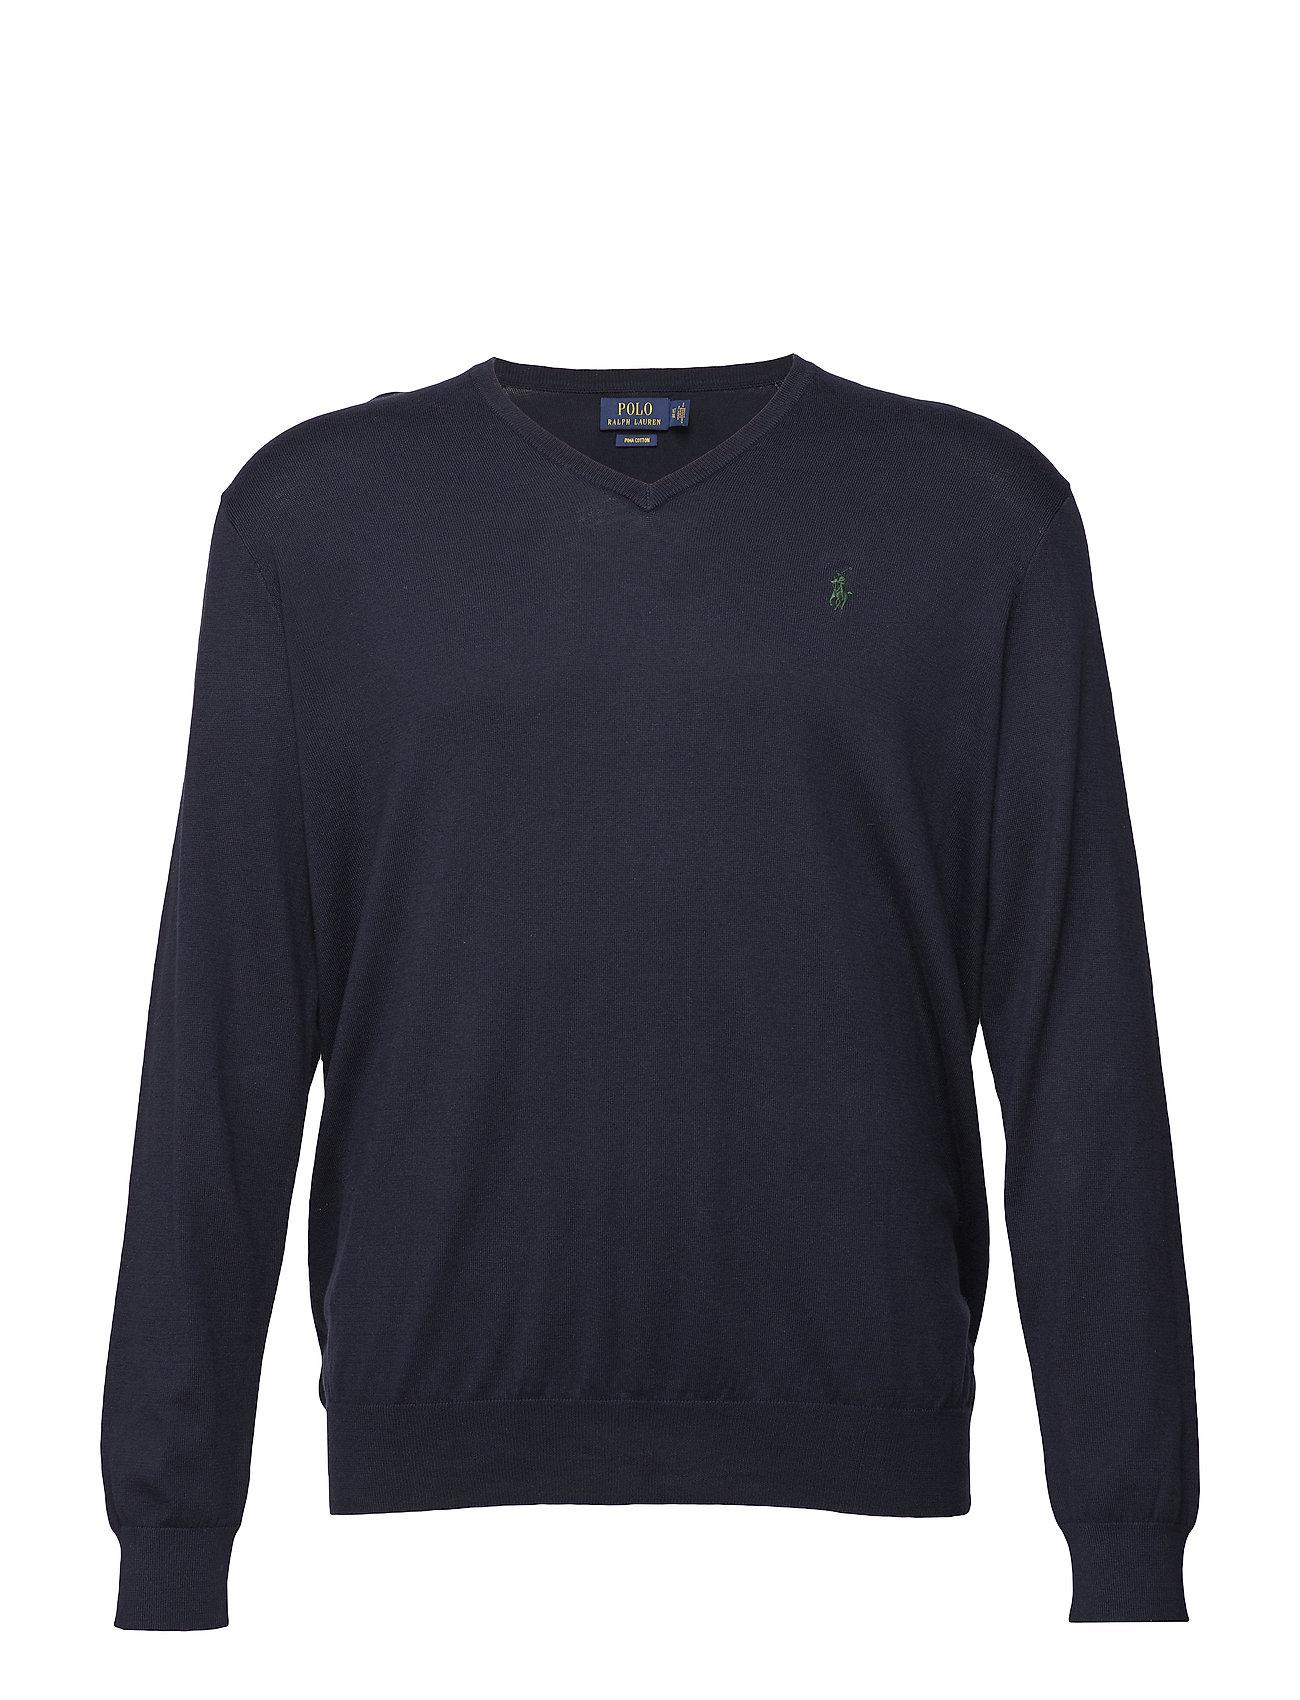 Polo Ralph Lauren Big & Tall Cotton V-Neck Sweater - HUNTER NAVY